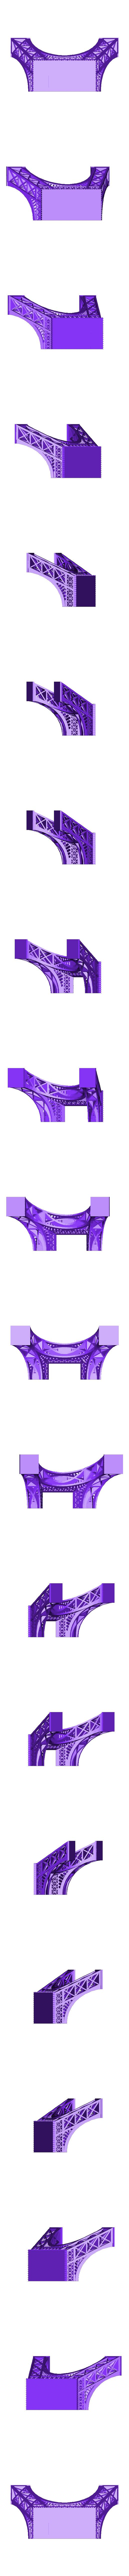 EiffelTower_part_E1.stl Download free STL file Eiffel Tower tricolor • 3D printable object, jteix